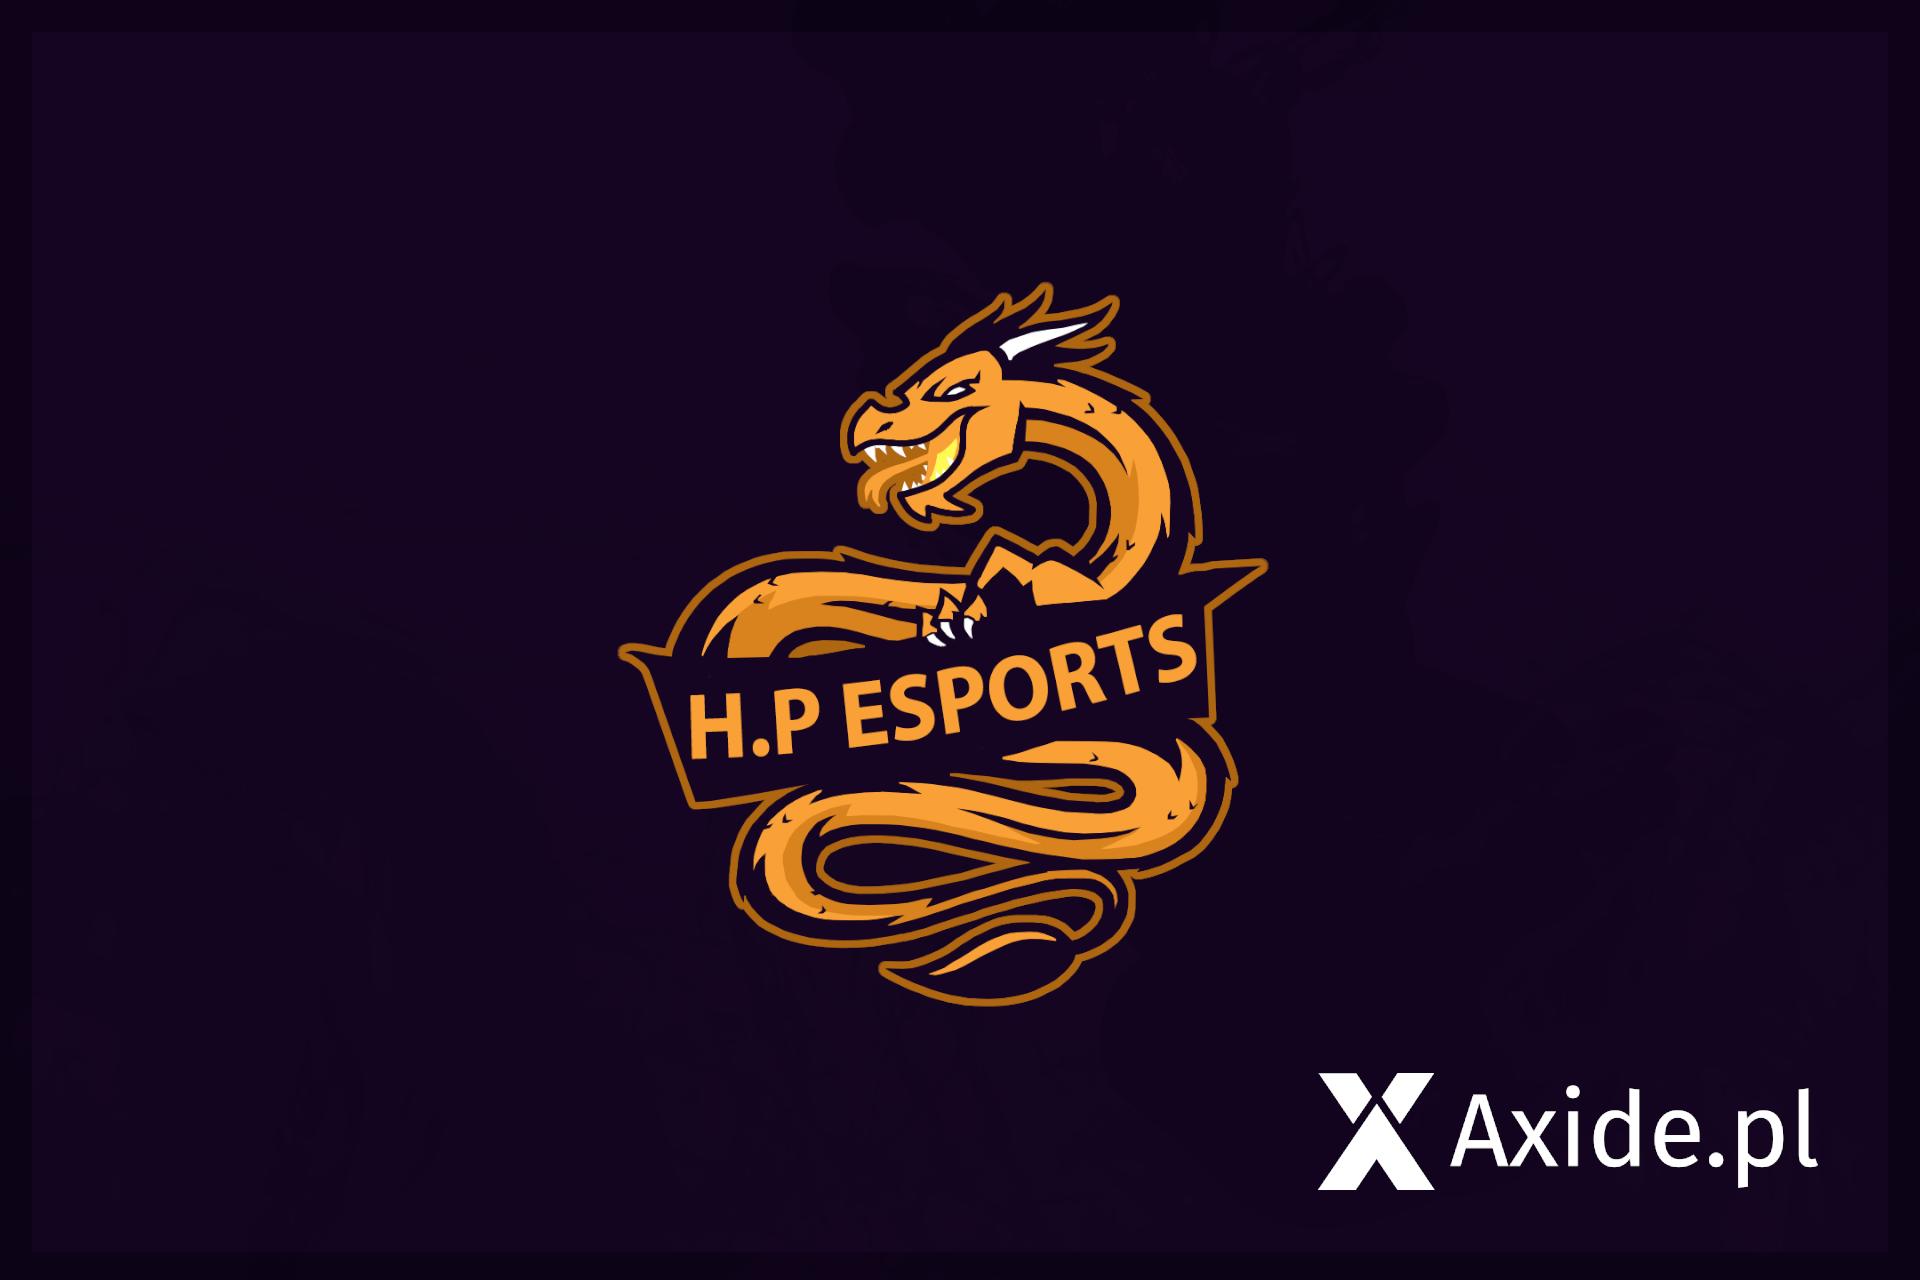 h.p esports